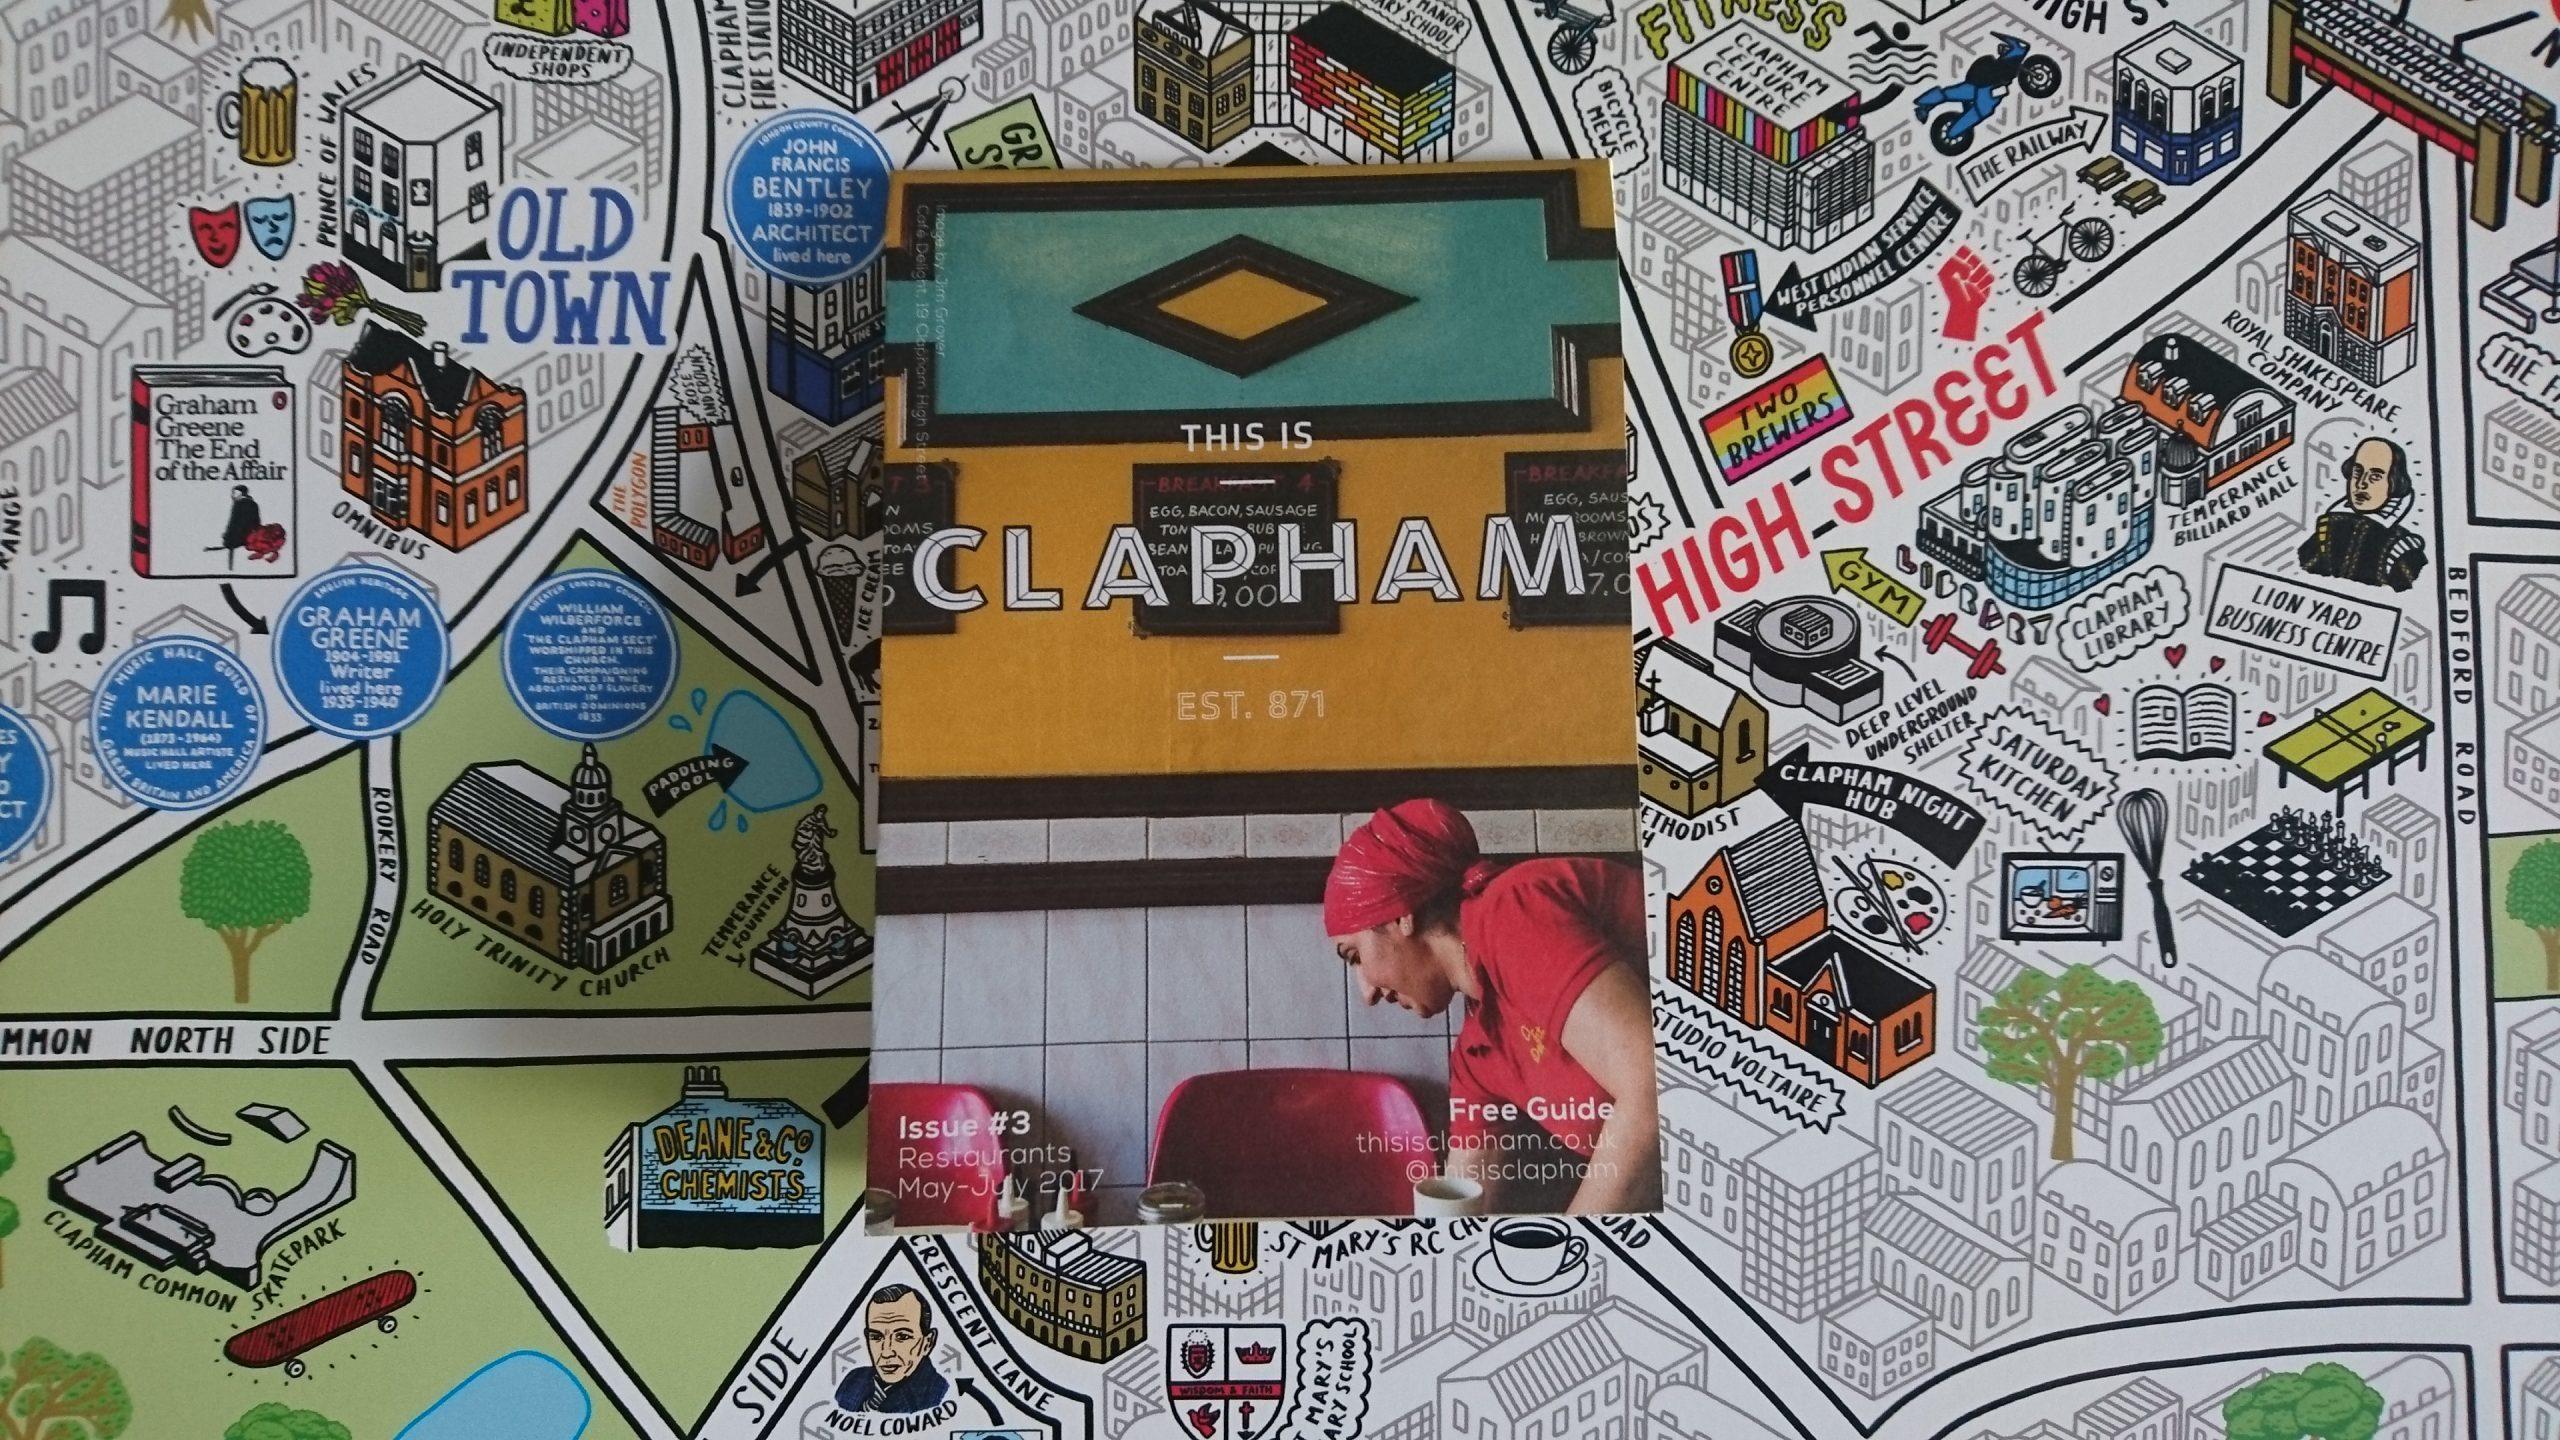 Clapham Restaurant Guide